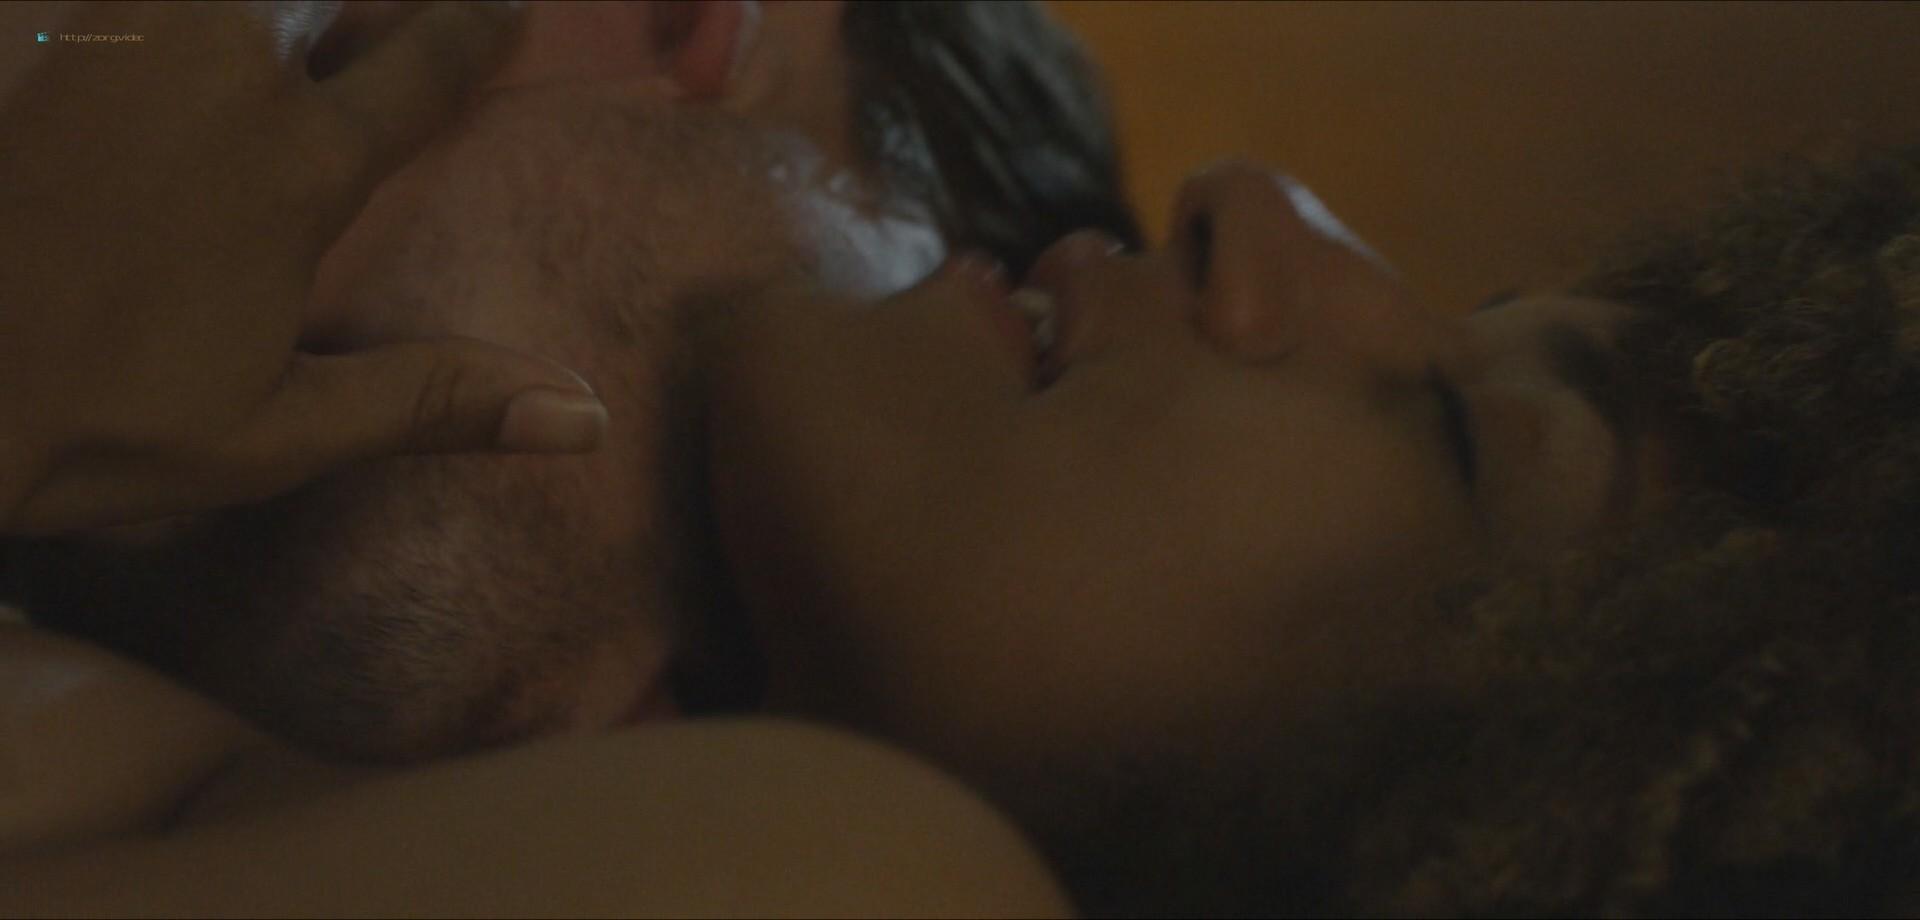 Ariana DeBose sexy lesbian sex with Steffanie Leigh - Seaside (2018) HD 1080 Web (12)